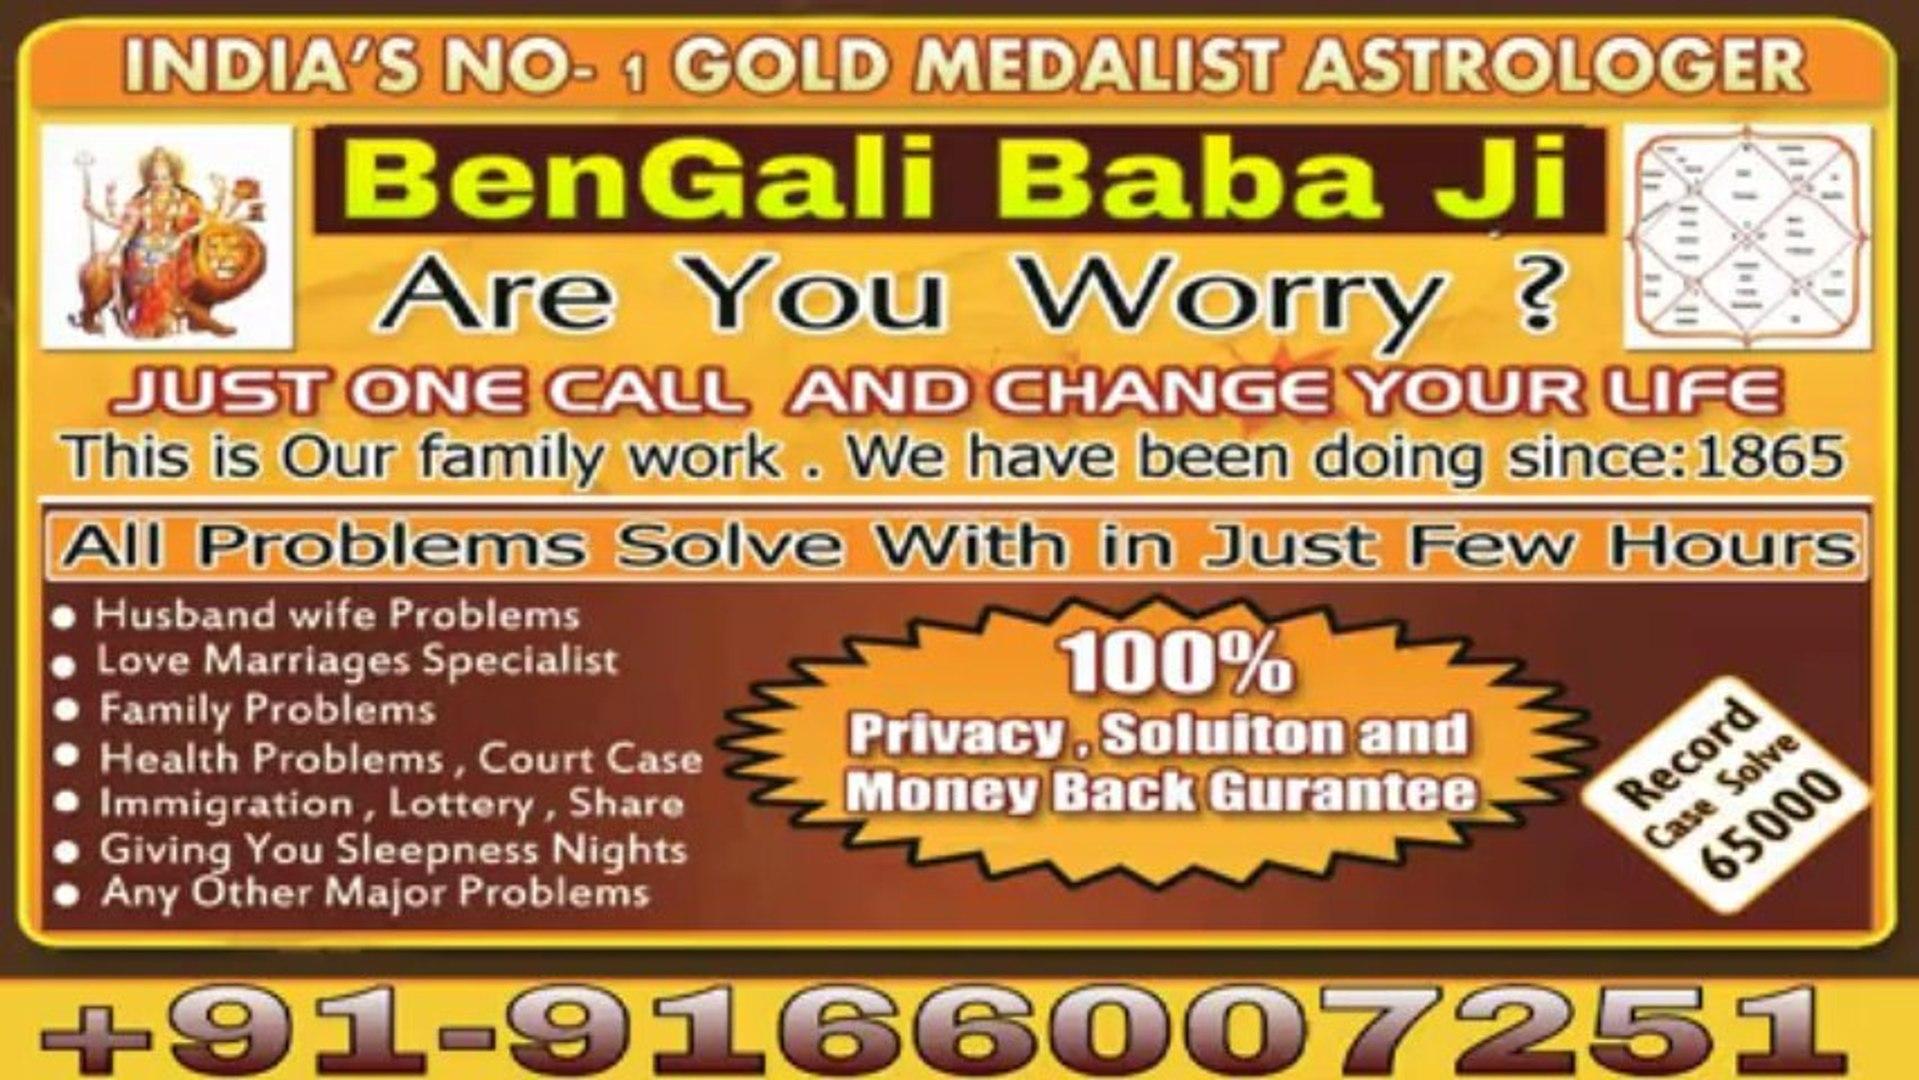 Vashikaran Mantra mohini vashikaran Mantra Specialist Bengali Baba Ji  +91-9166007251